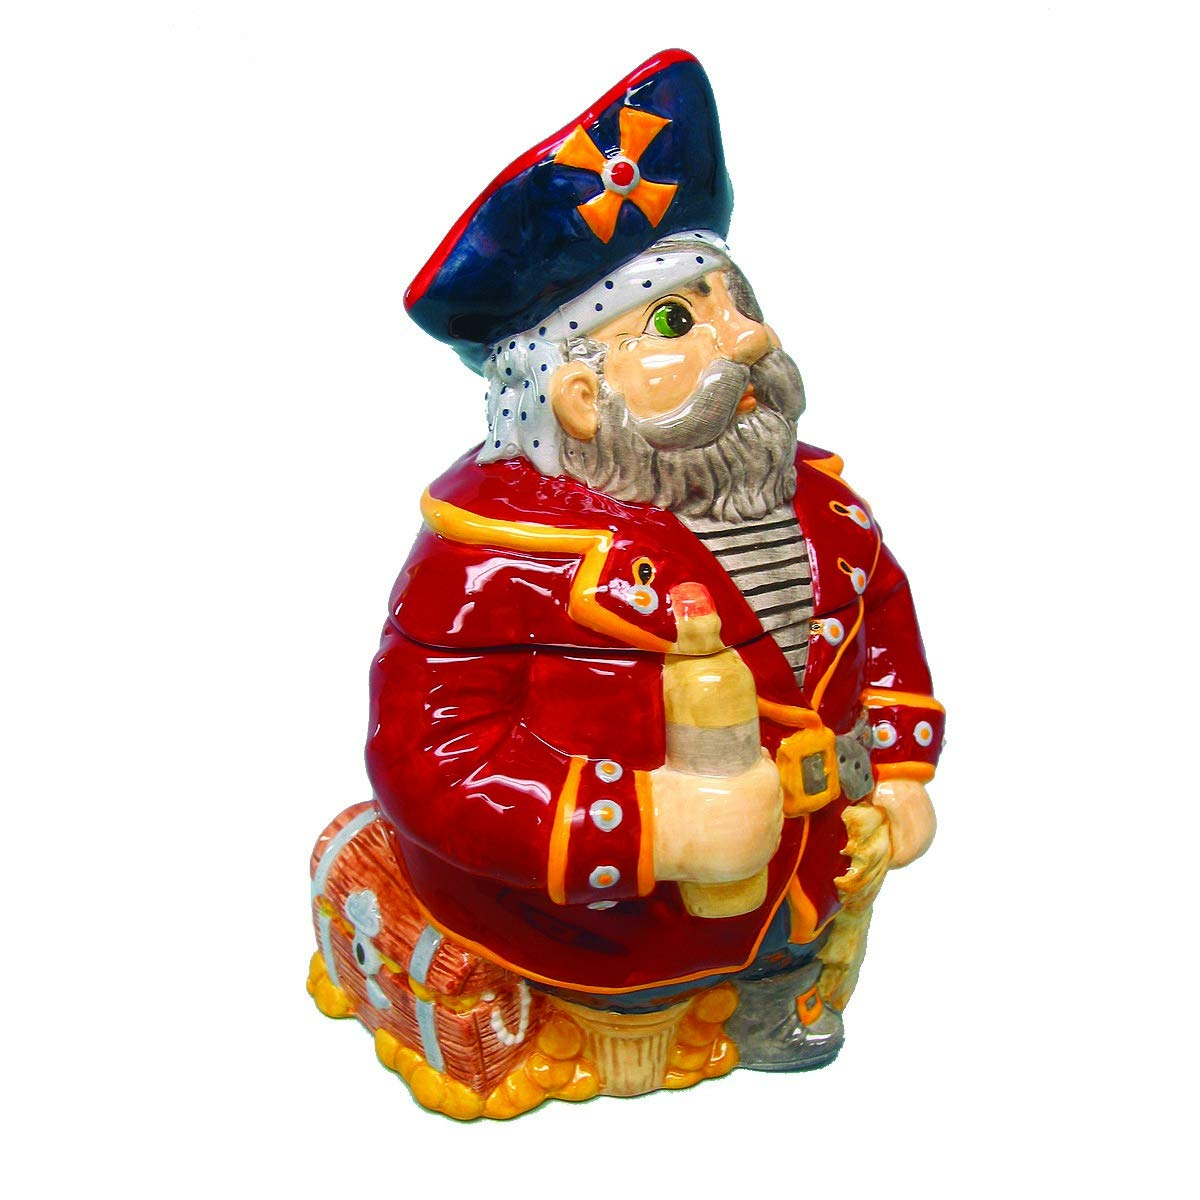 Hand Painted Ceramic Nautical Sea Pirate Gasparilla Cookie Jar